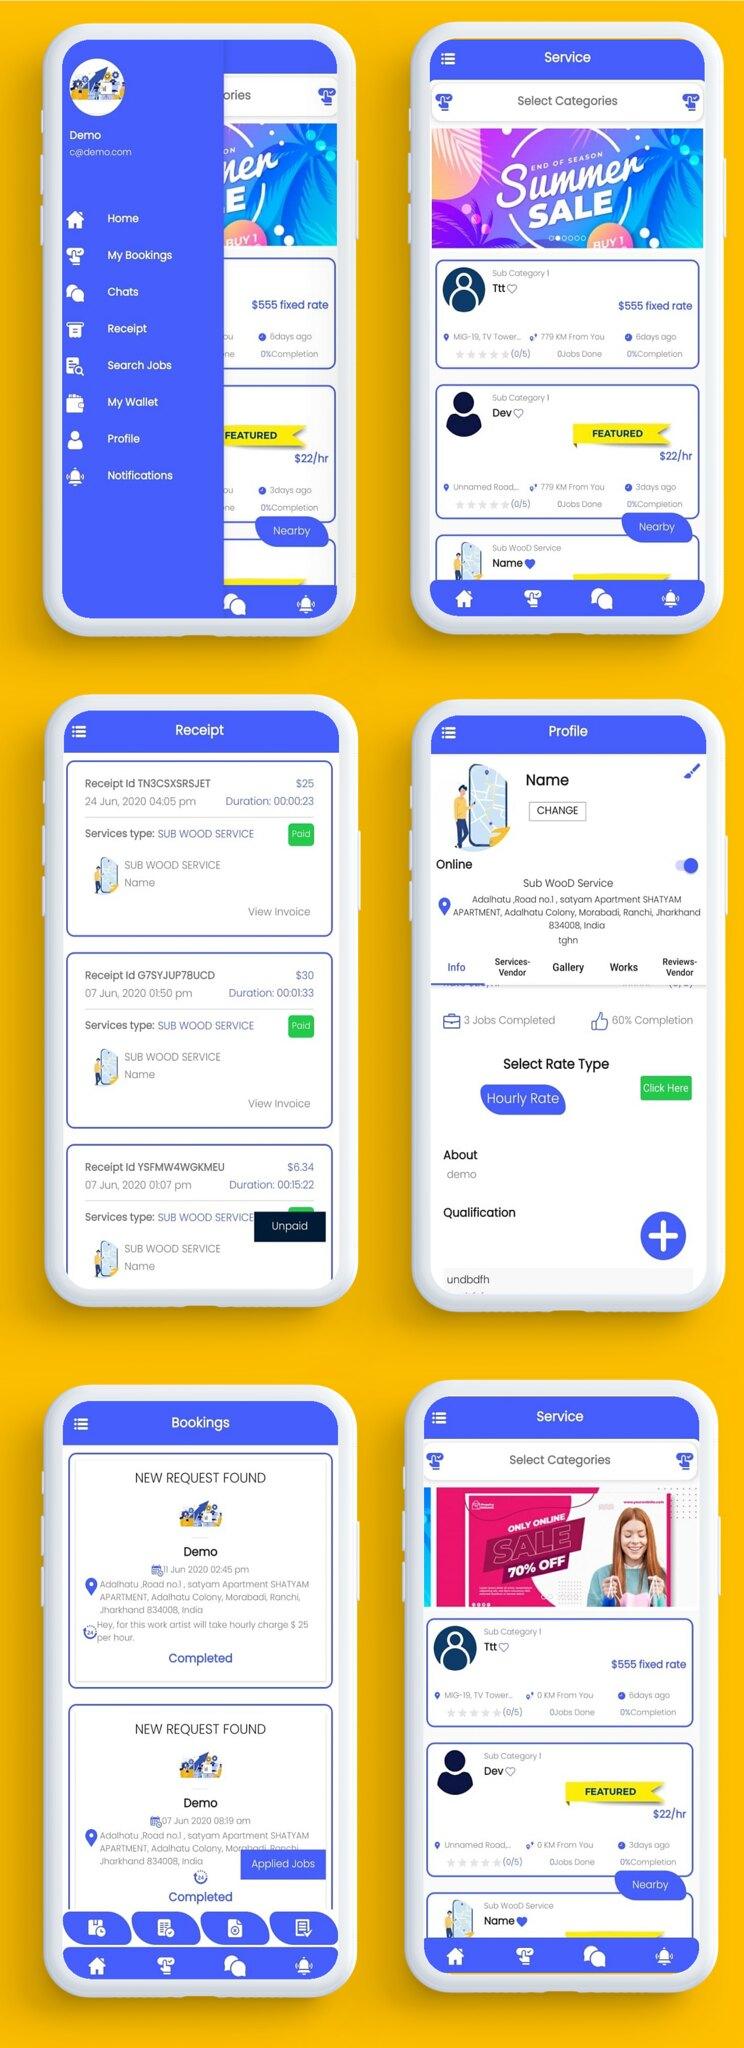 U Clab Service App | Service At Home | Multi Payment Gateways Integrated | Multi Login - 2